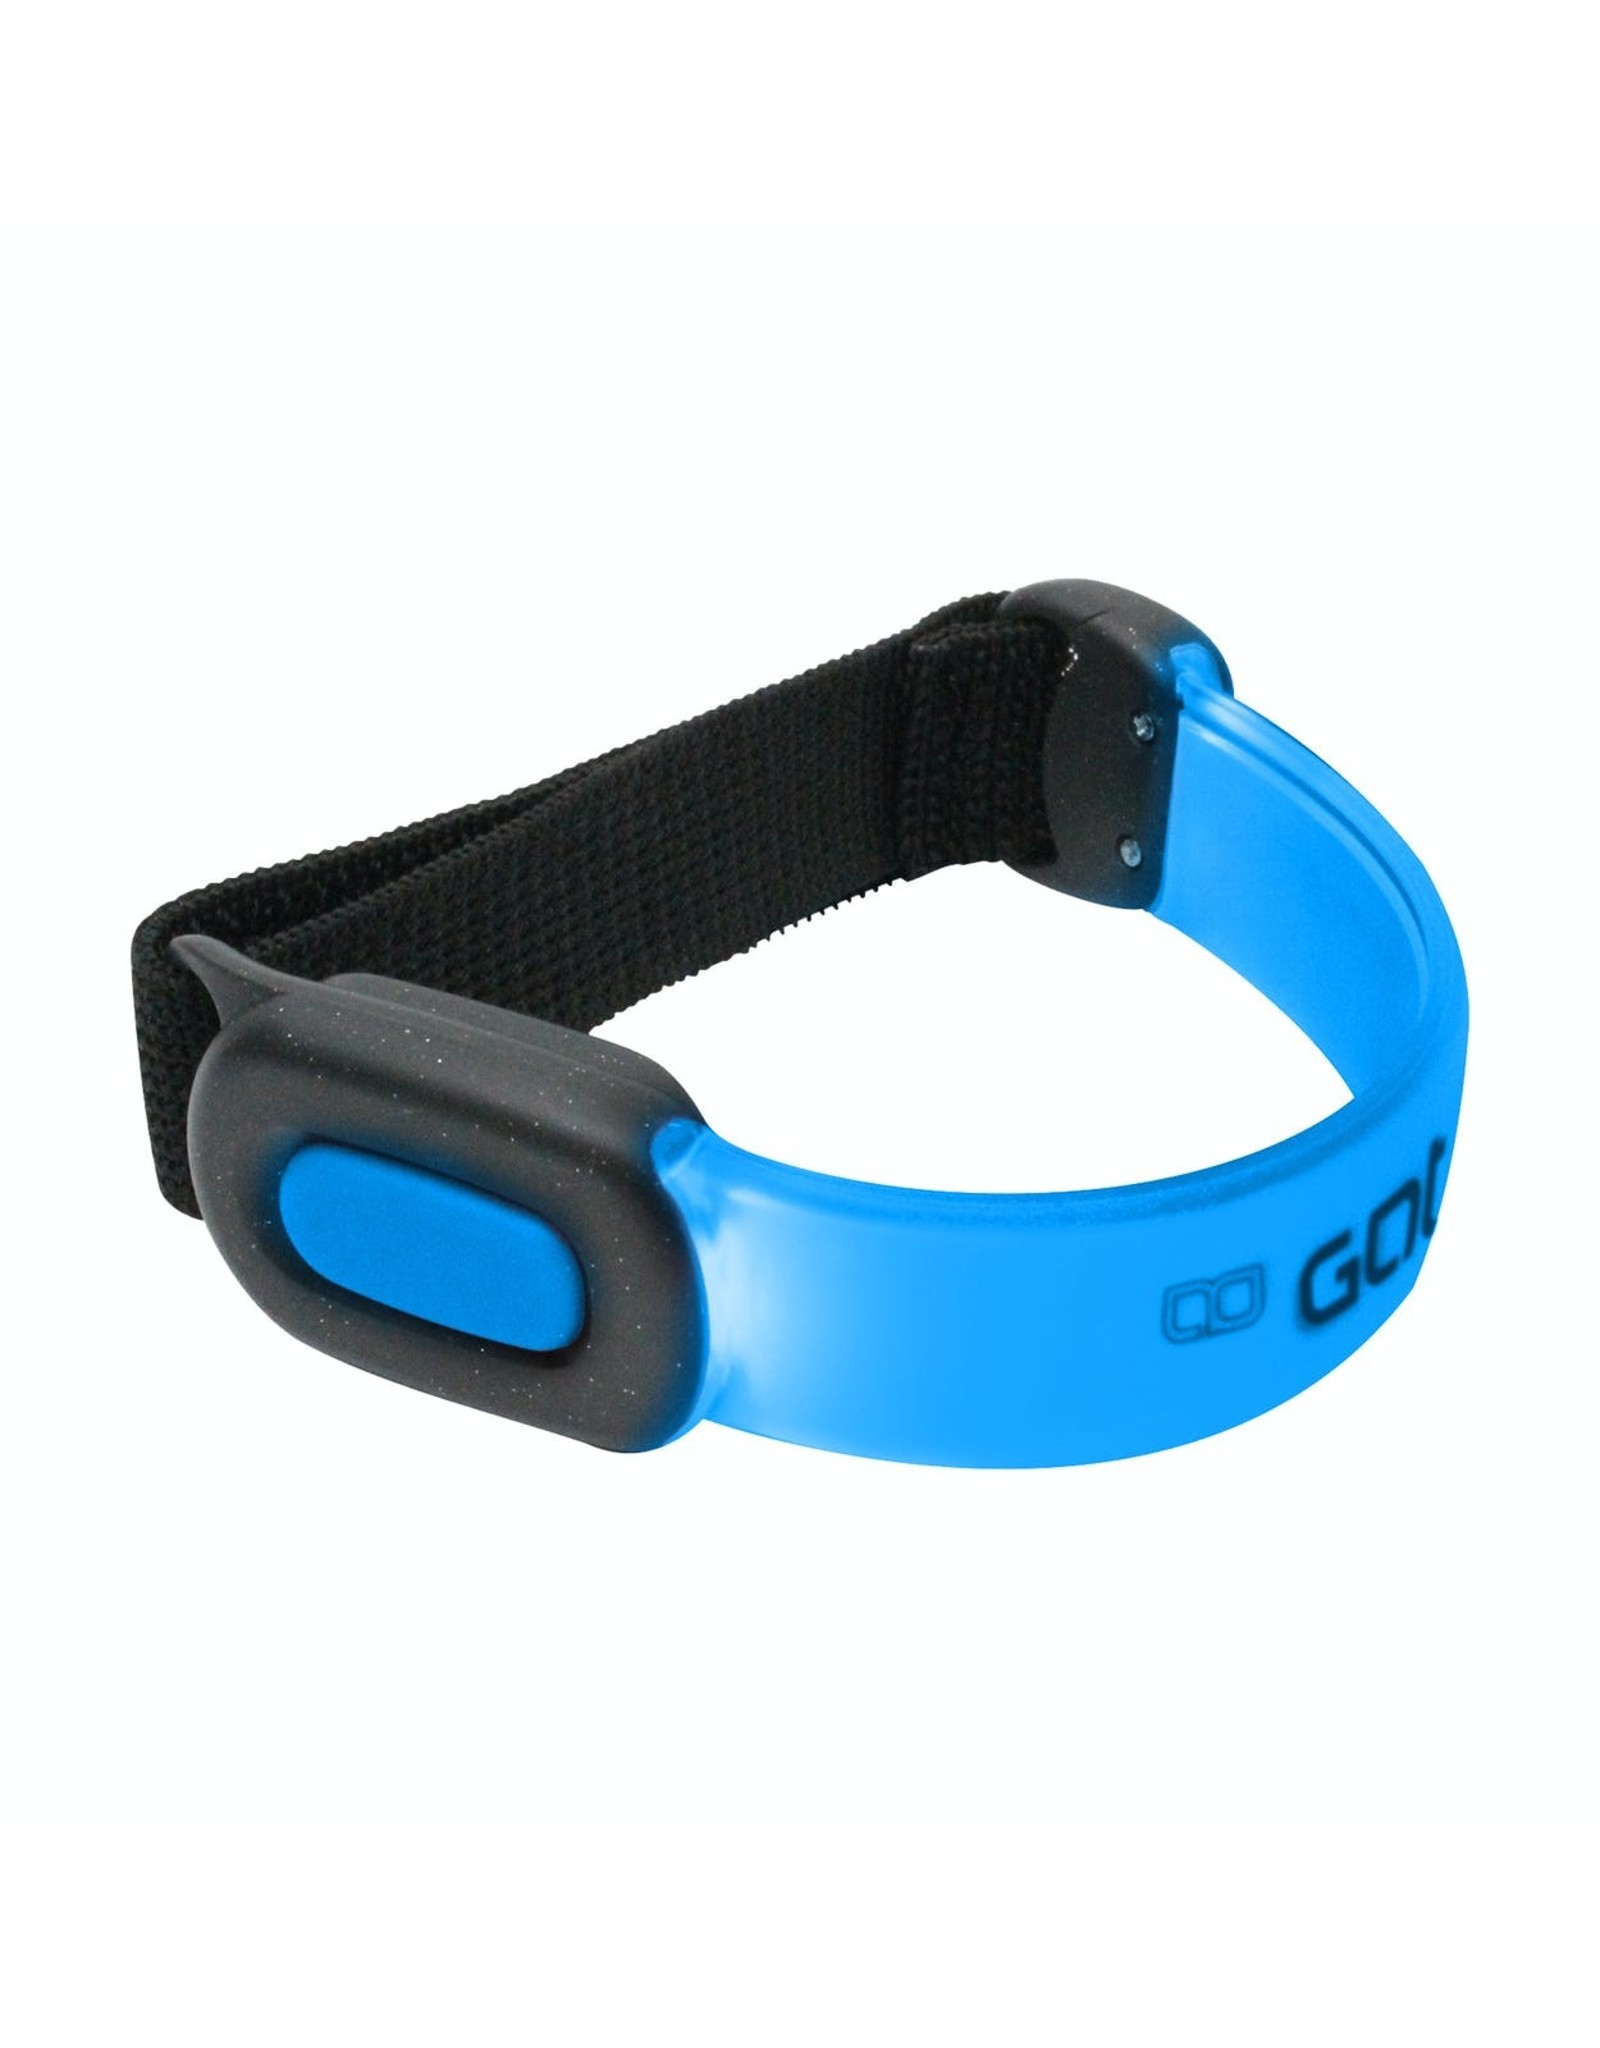 Gato USB NEON LED ARM LIGHT (Blue)